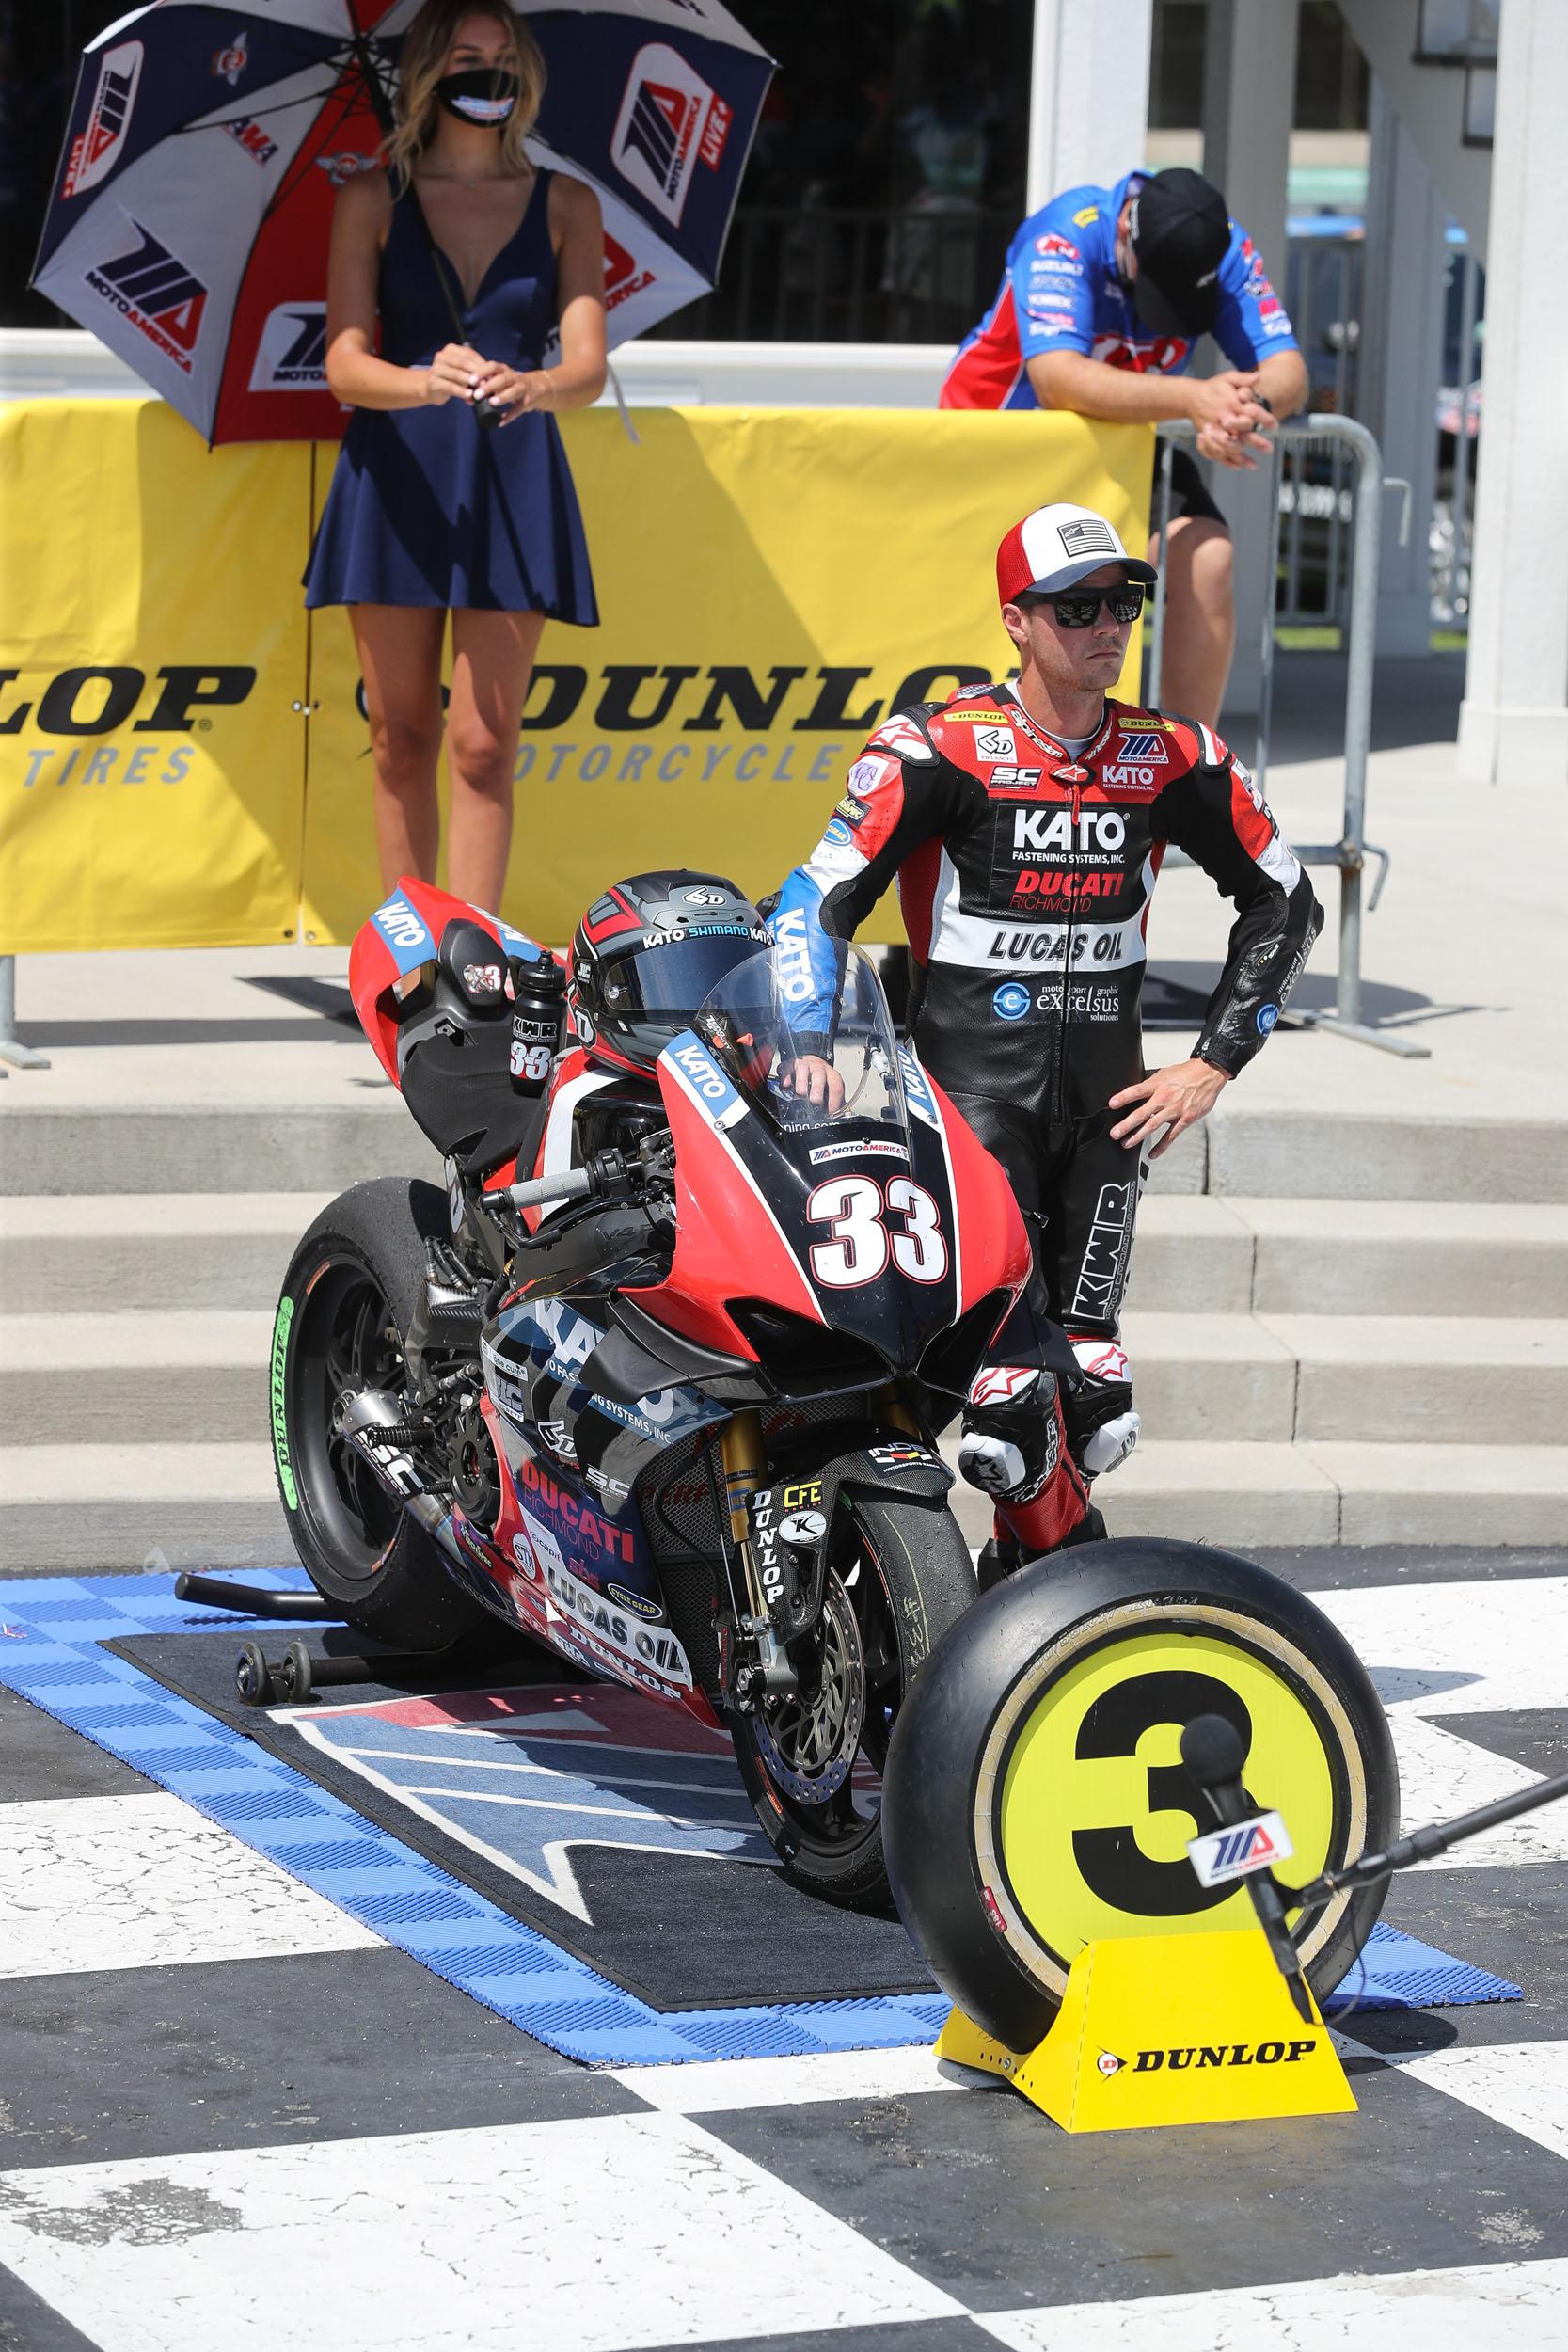 MotoAmerica - Superbike - Kyle Wyman #33 (3) podium